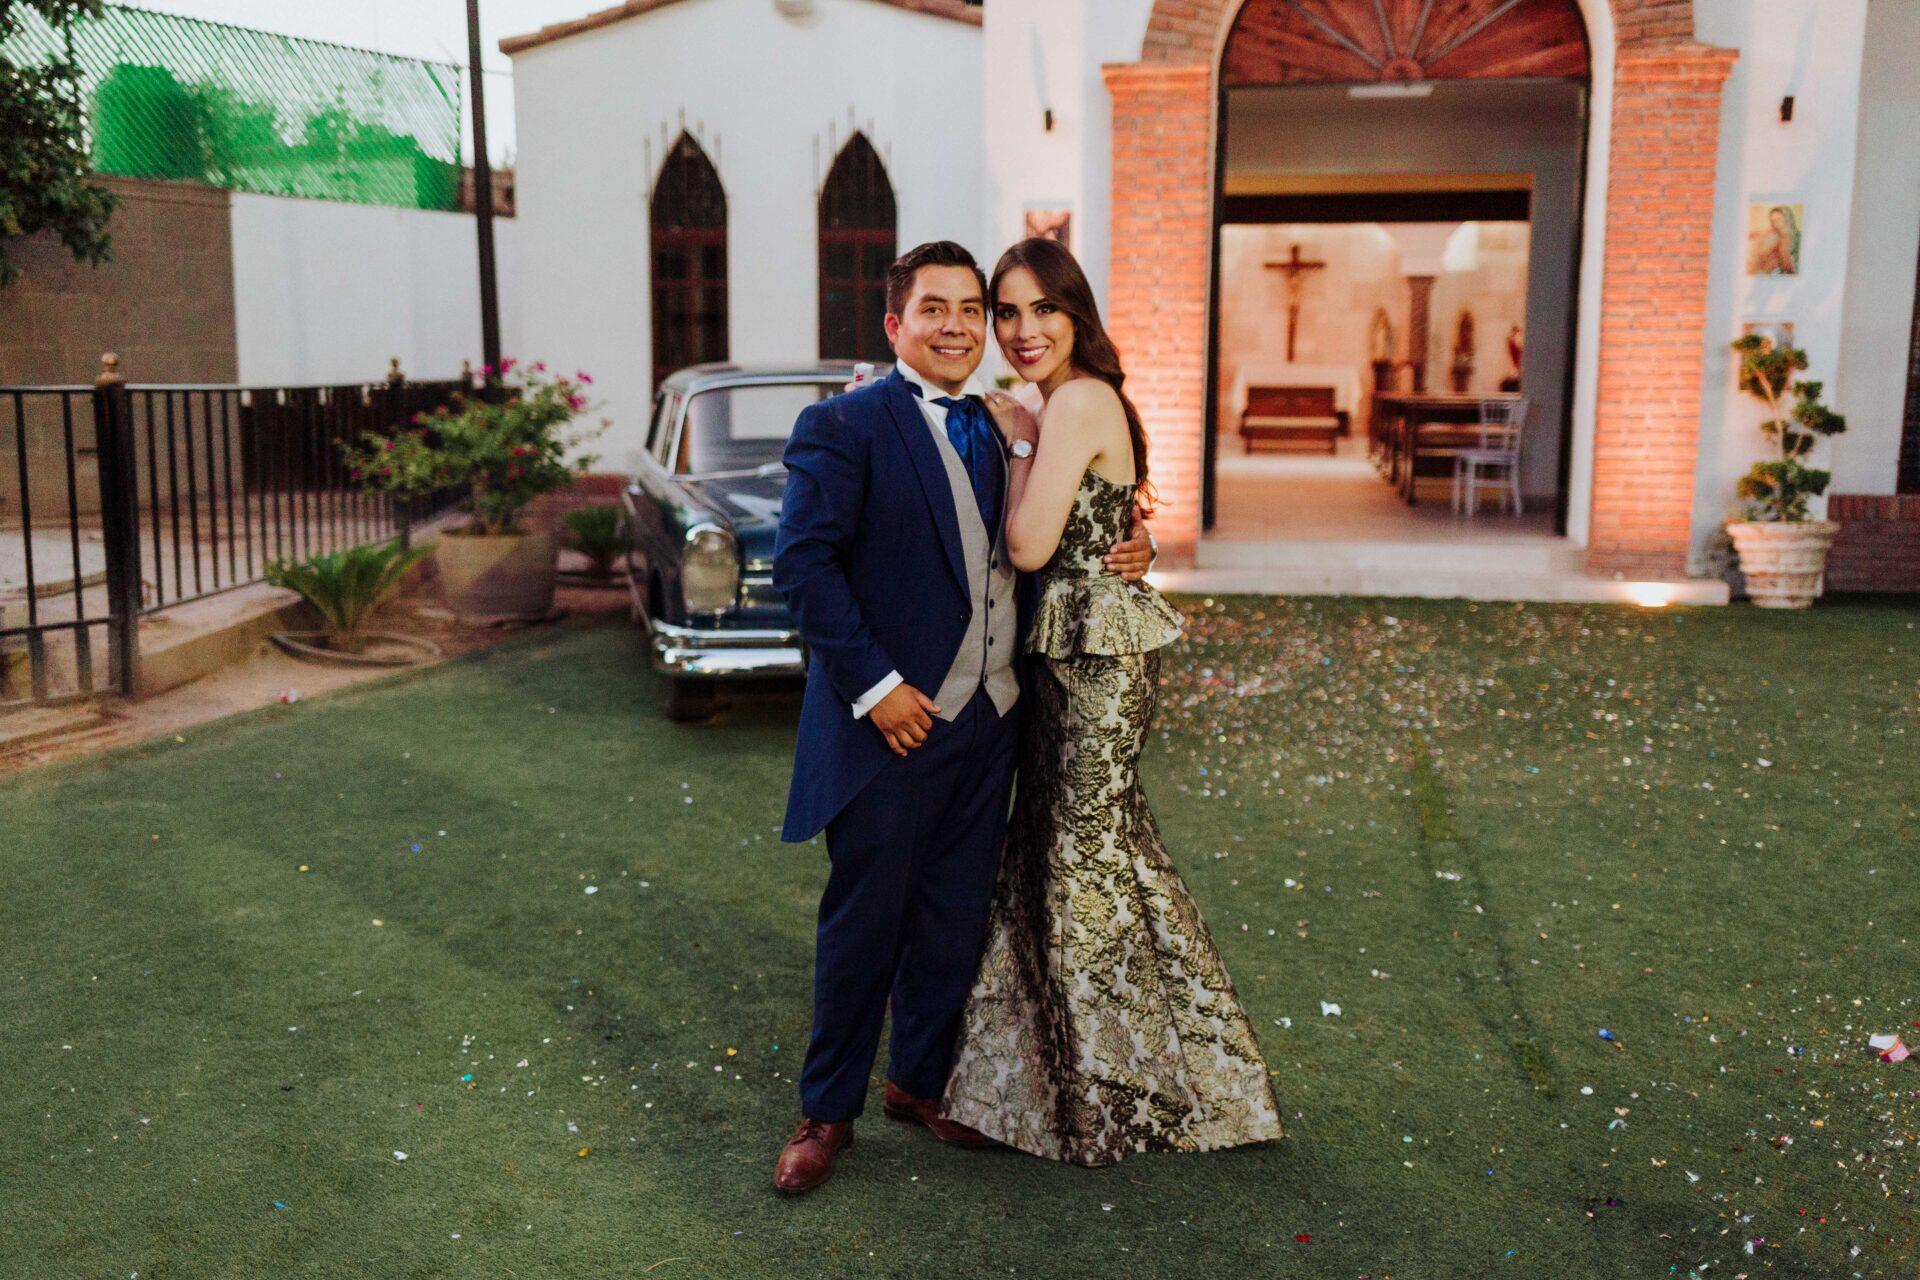 javier_noriega_fotografo_bodas_torreon_coahuila_zacatecas_wedding_photographer52a